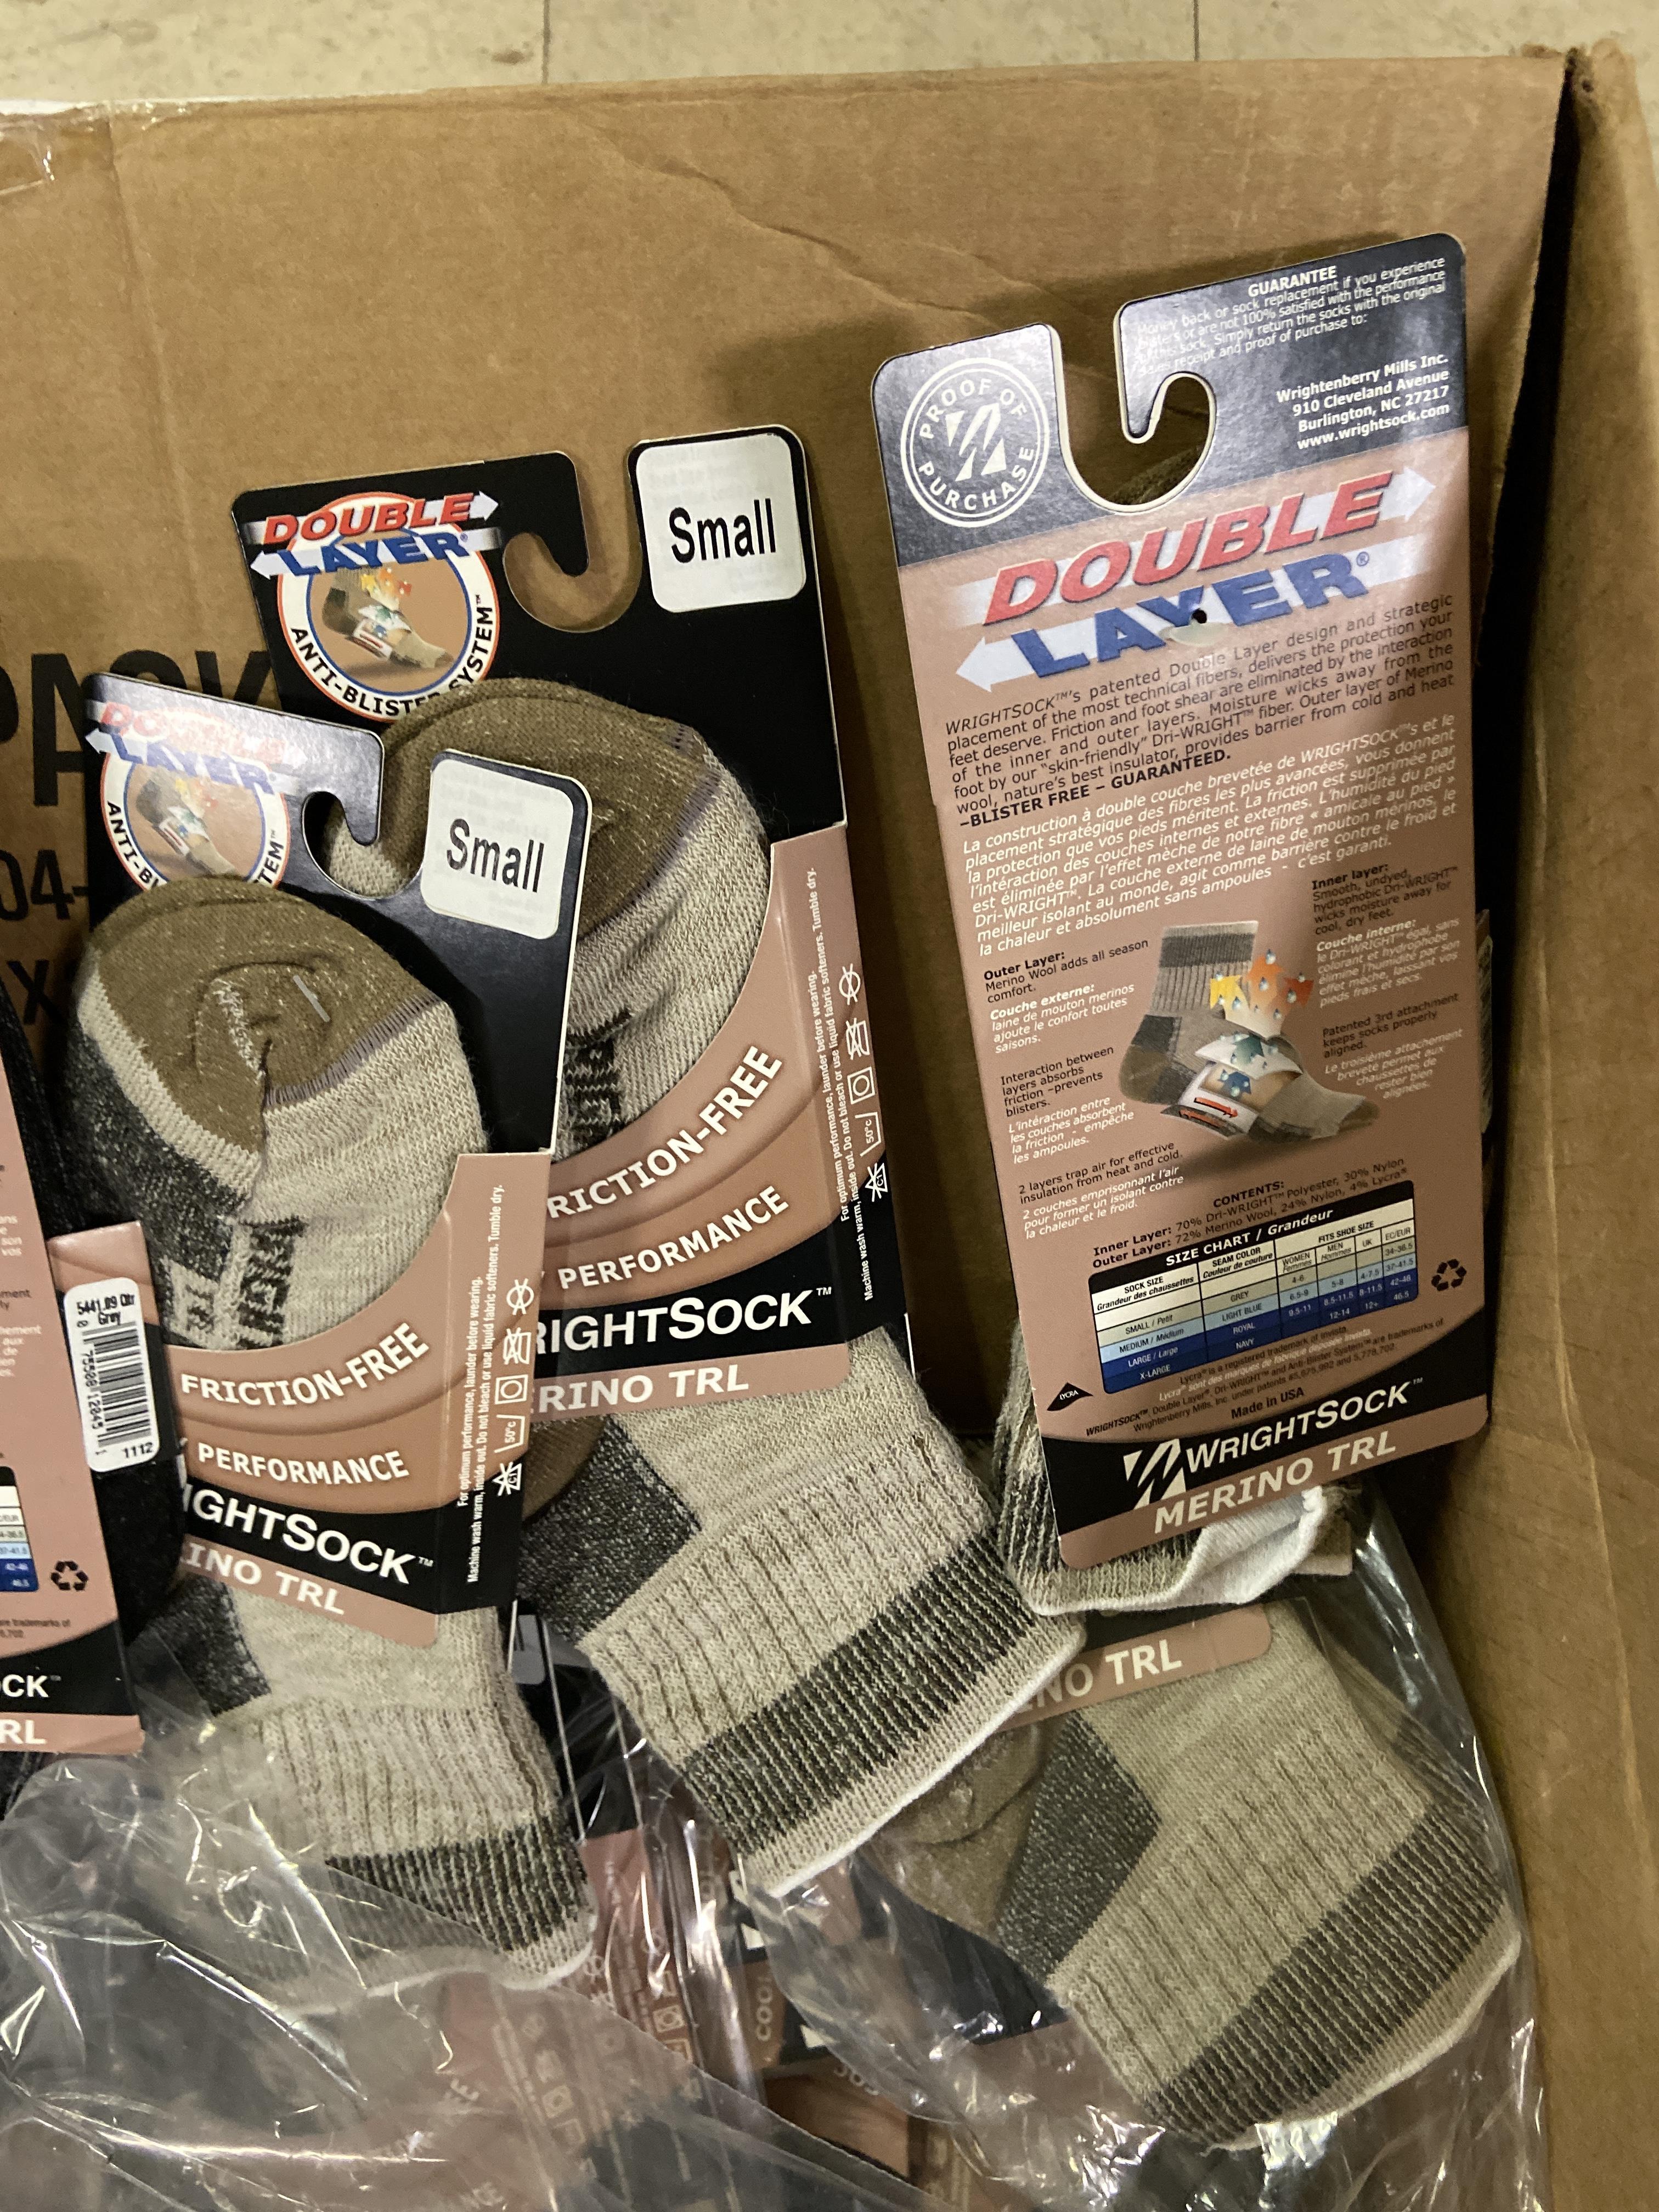 250+ packs of New Socks, Wrightsocks Merino TRL, Double Layer, Black/Gray/Tan - Image 3 of 3